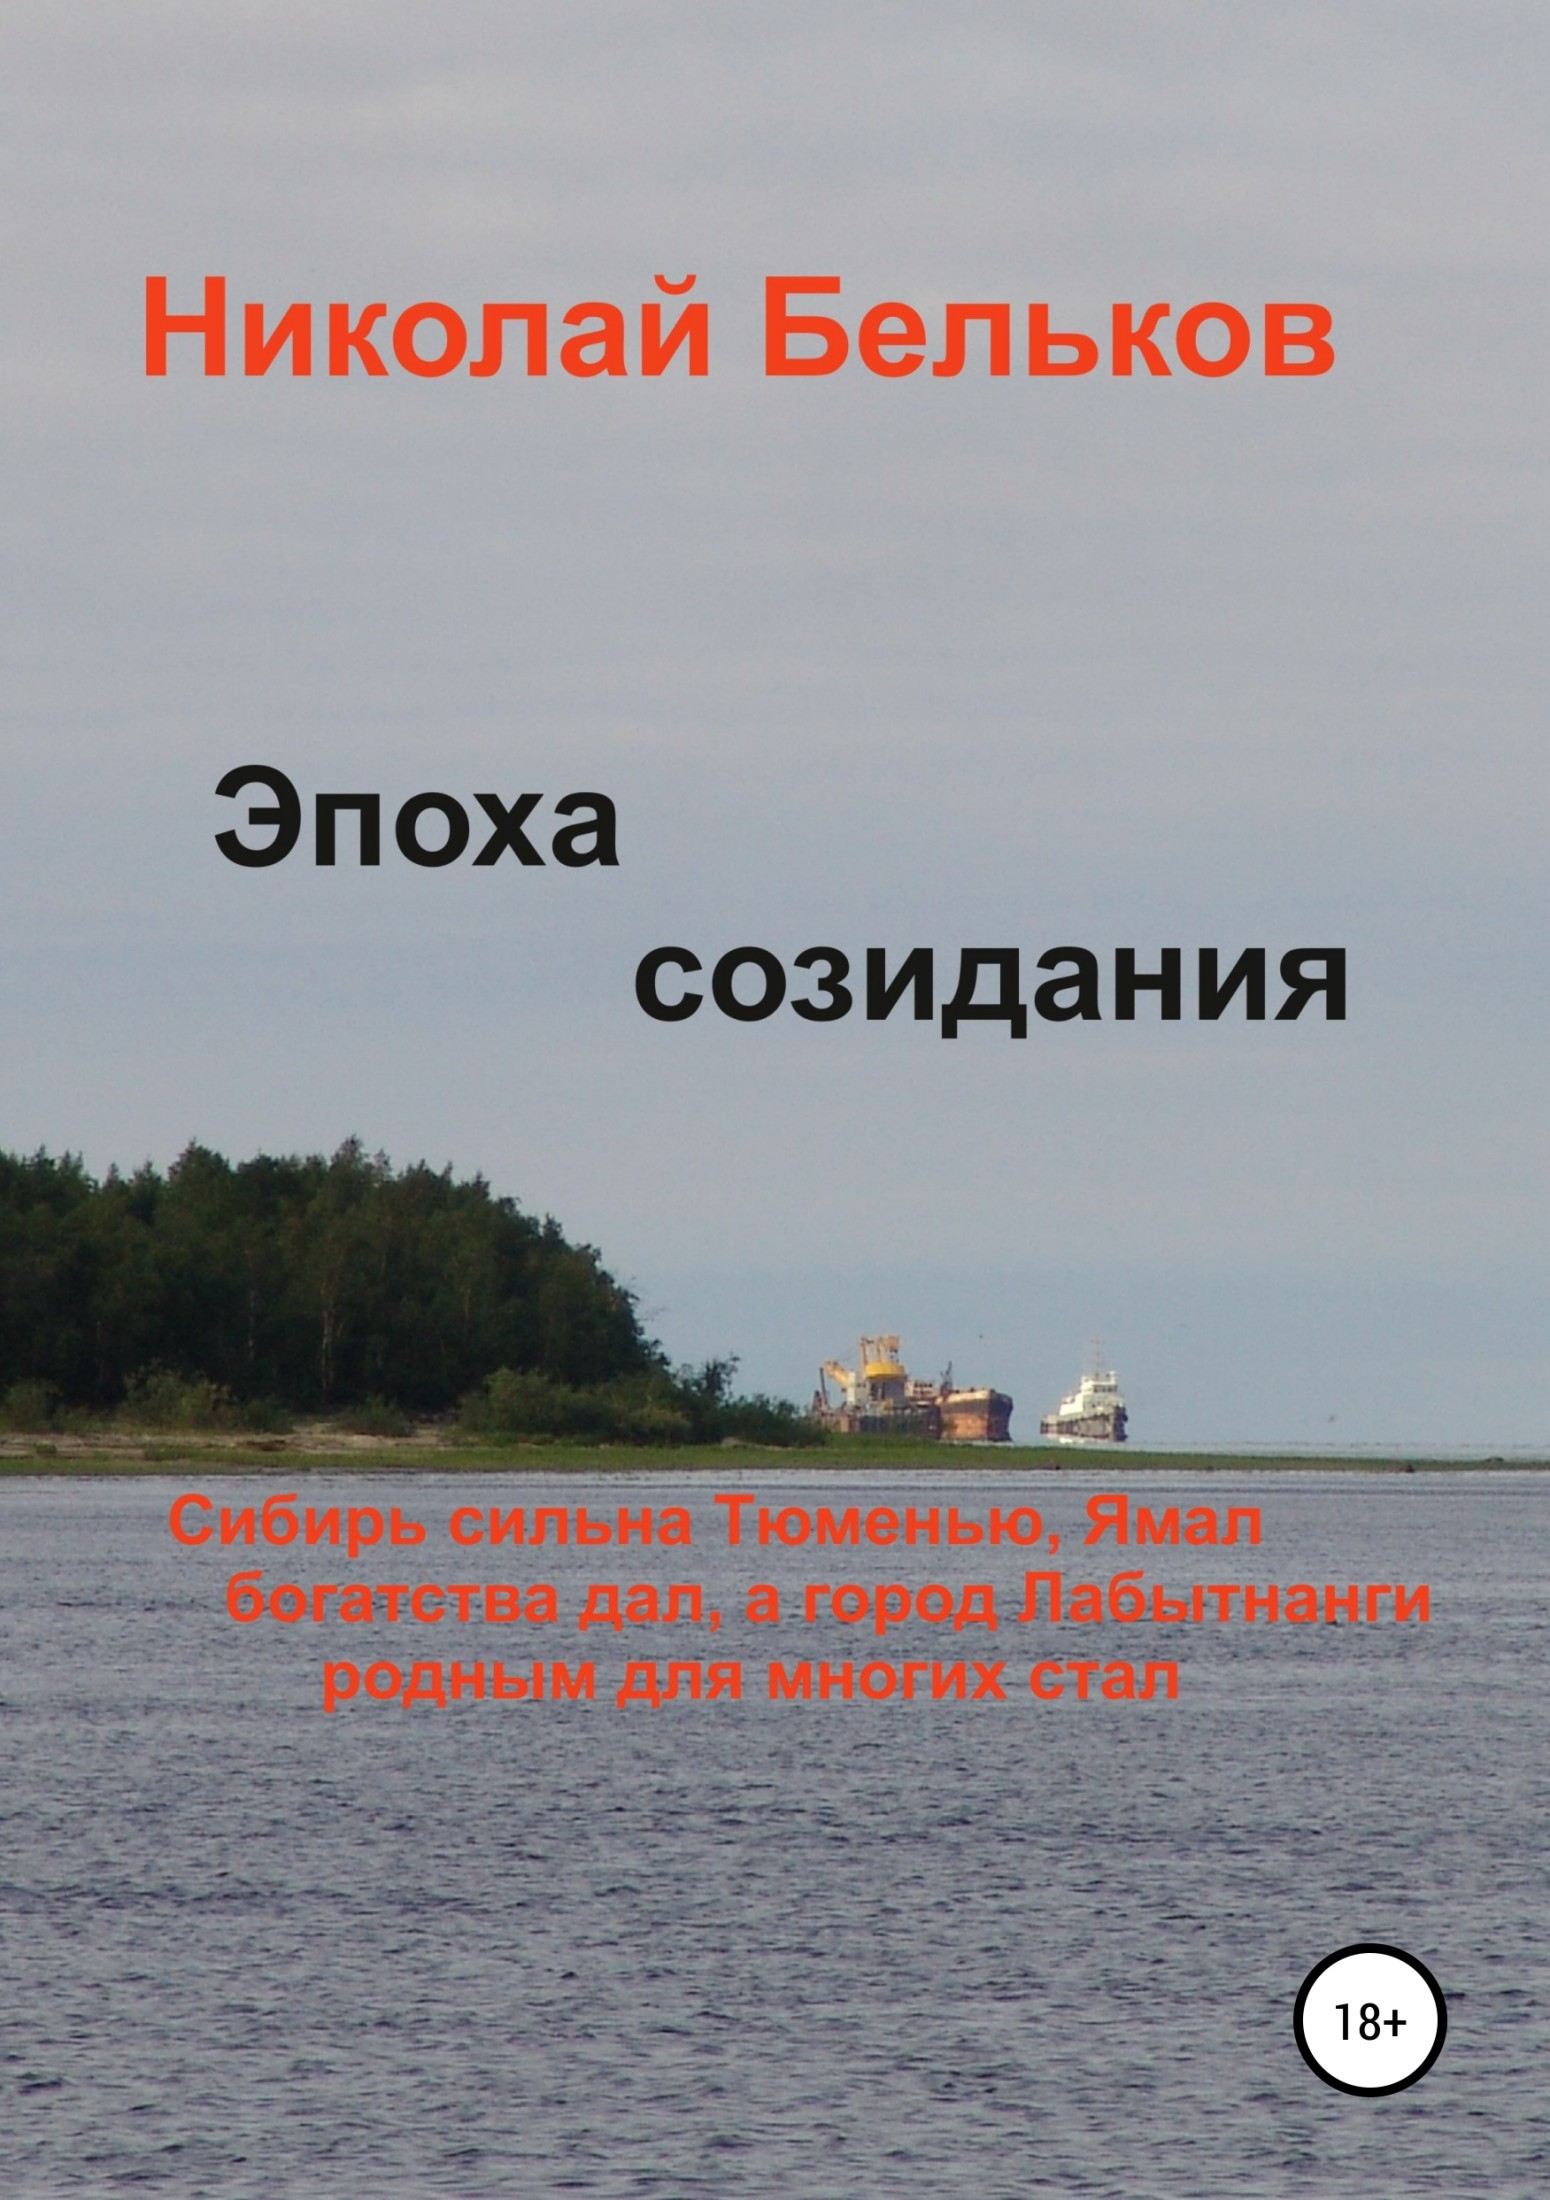 Николай Григорьеич Белько Эпоха созидания